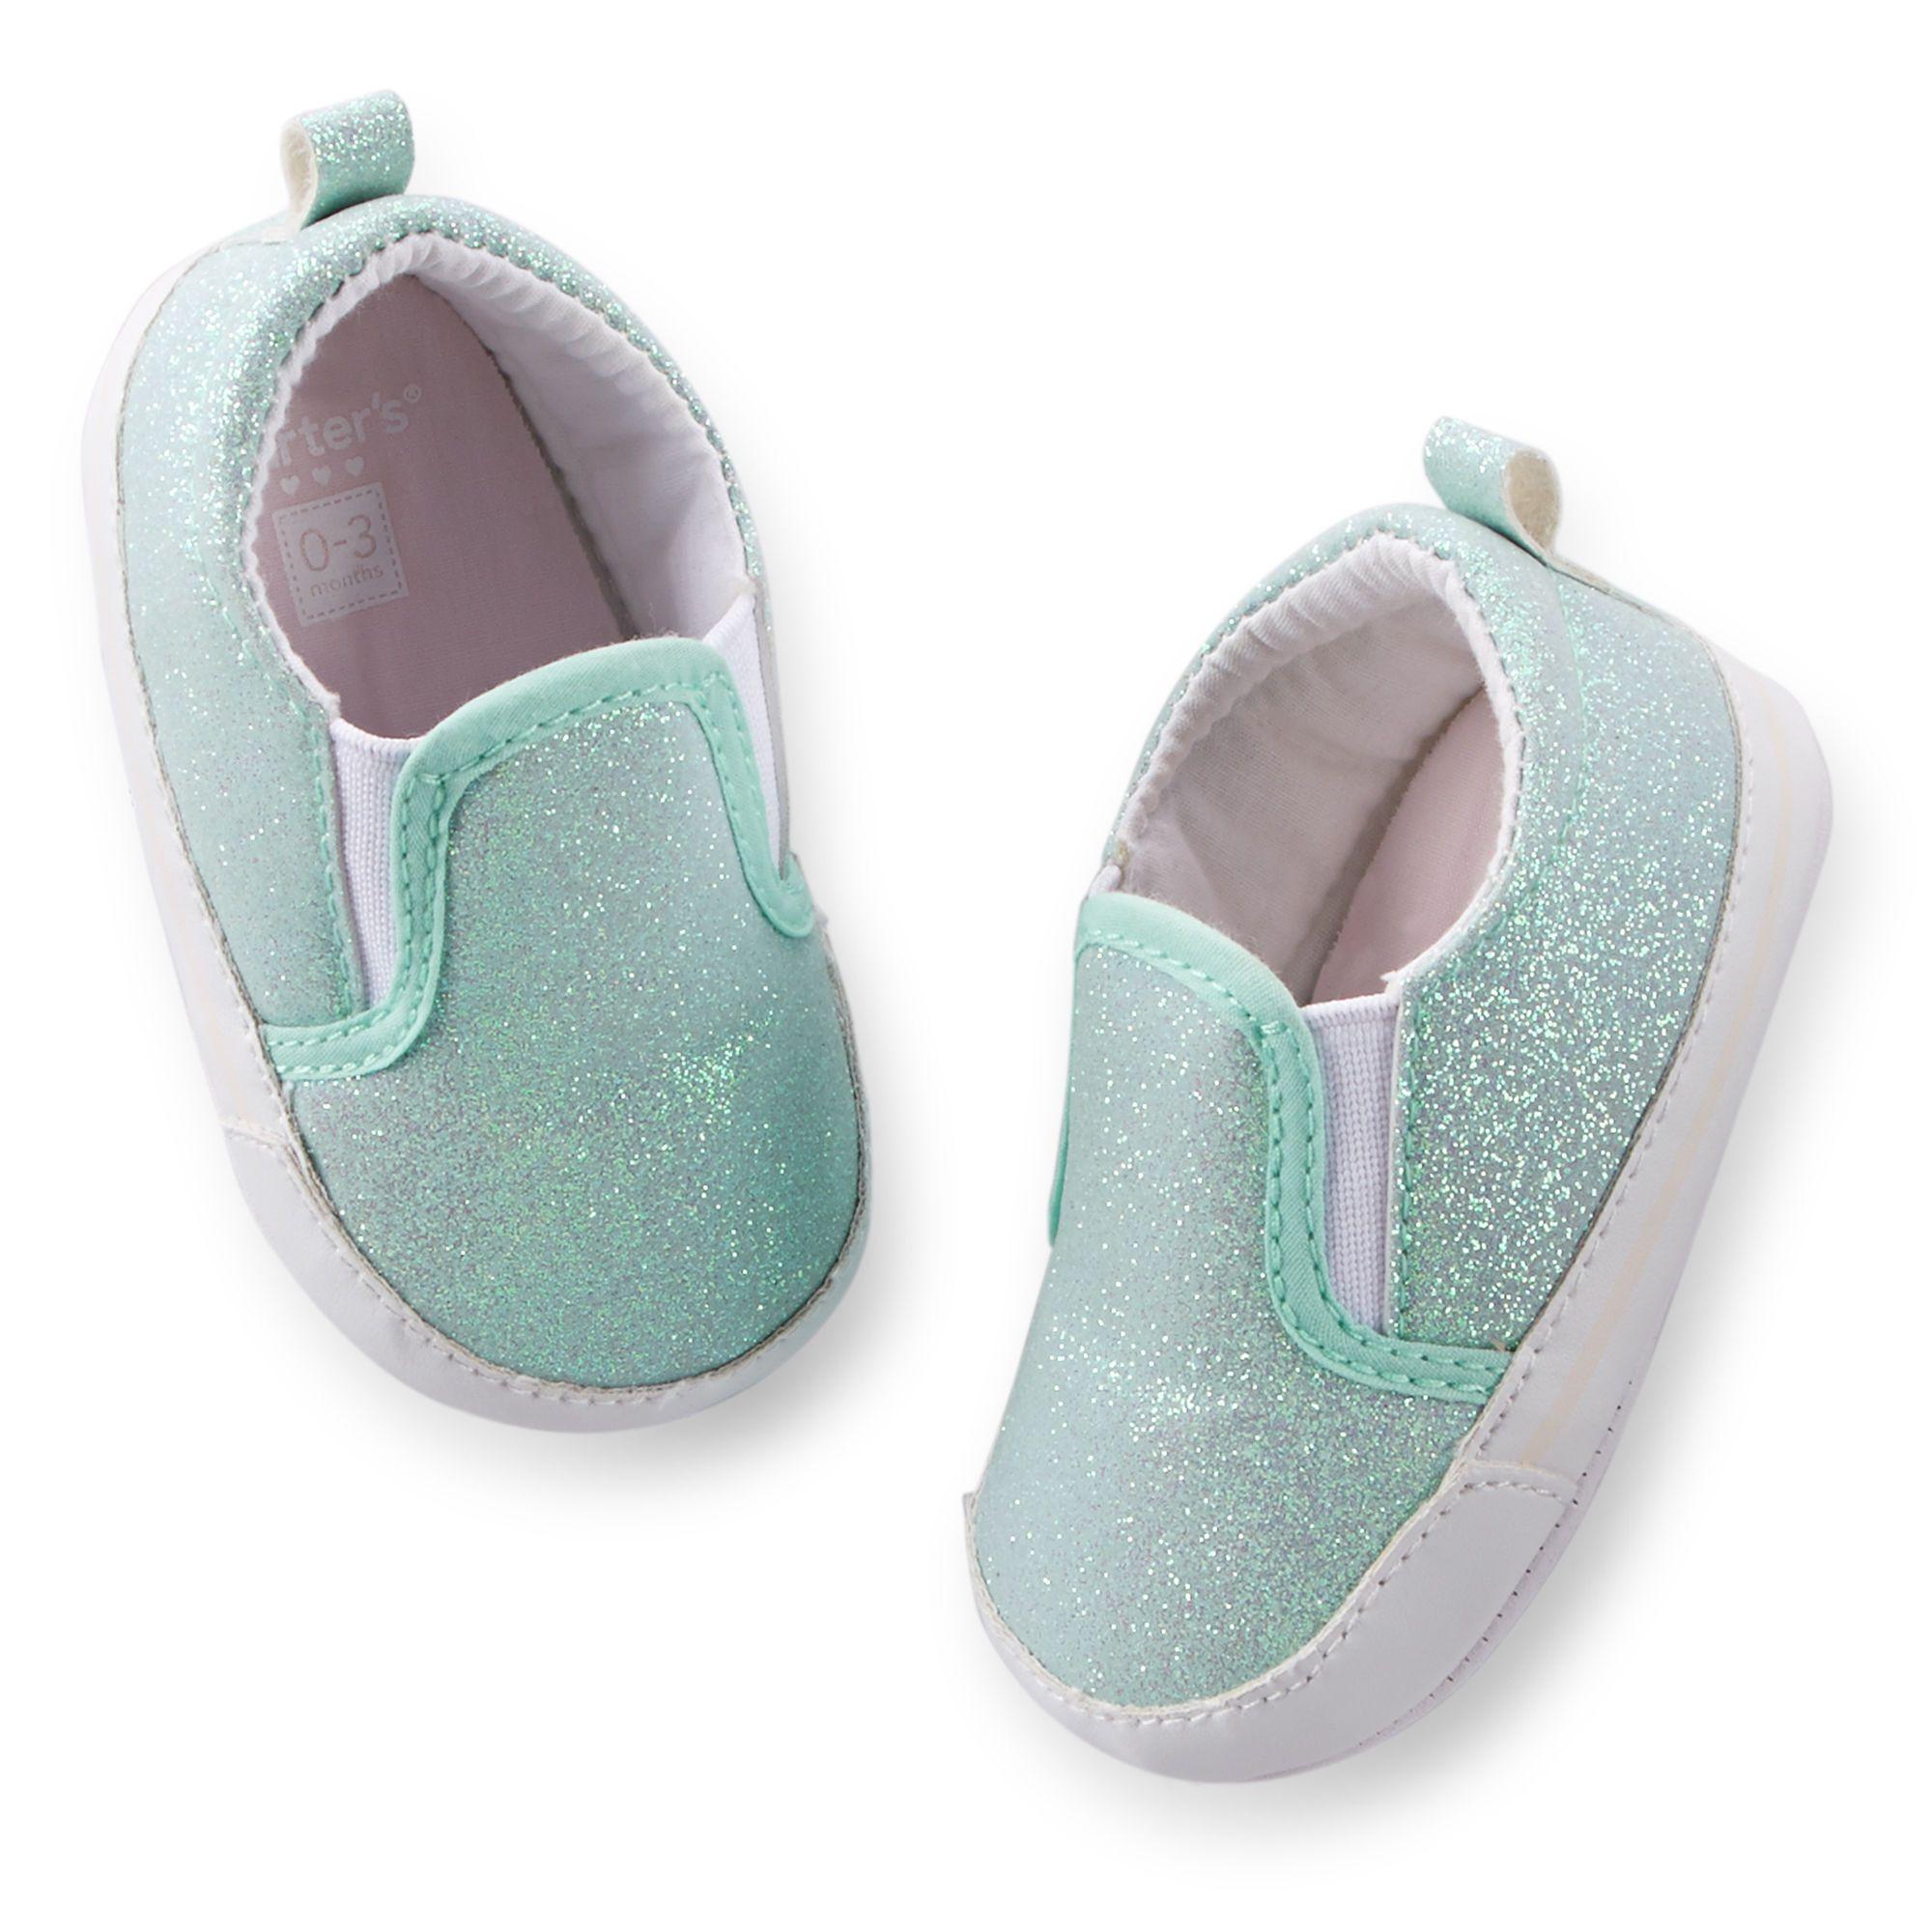 kids toomey sandals shoes comfort designer crib footwear fashion madeinusa cribs lindsay toms luxury star